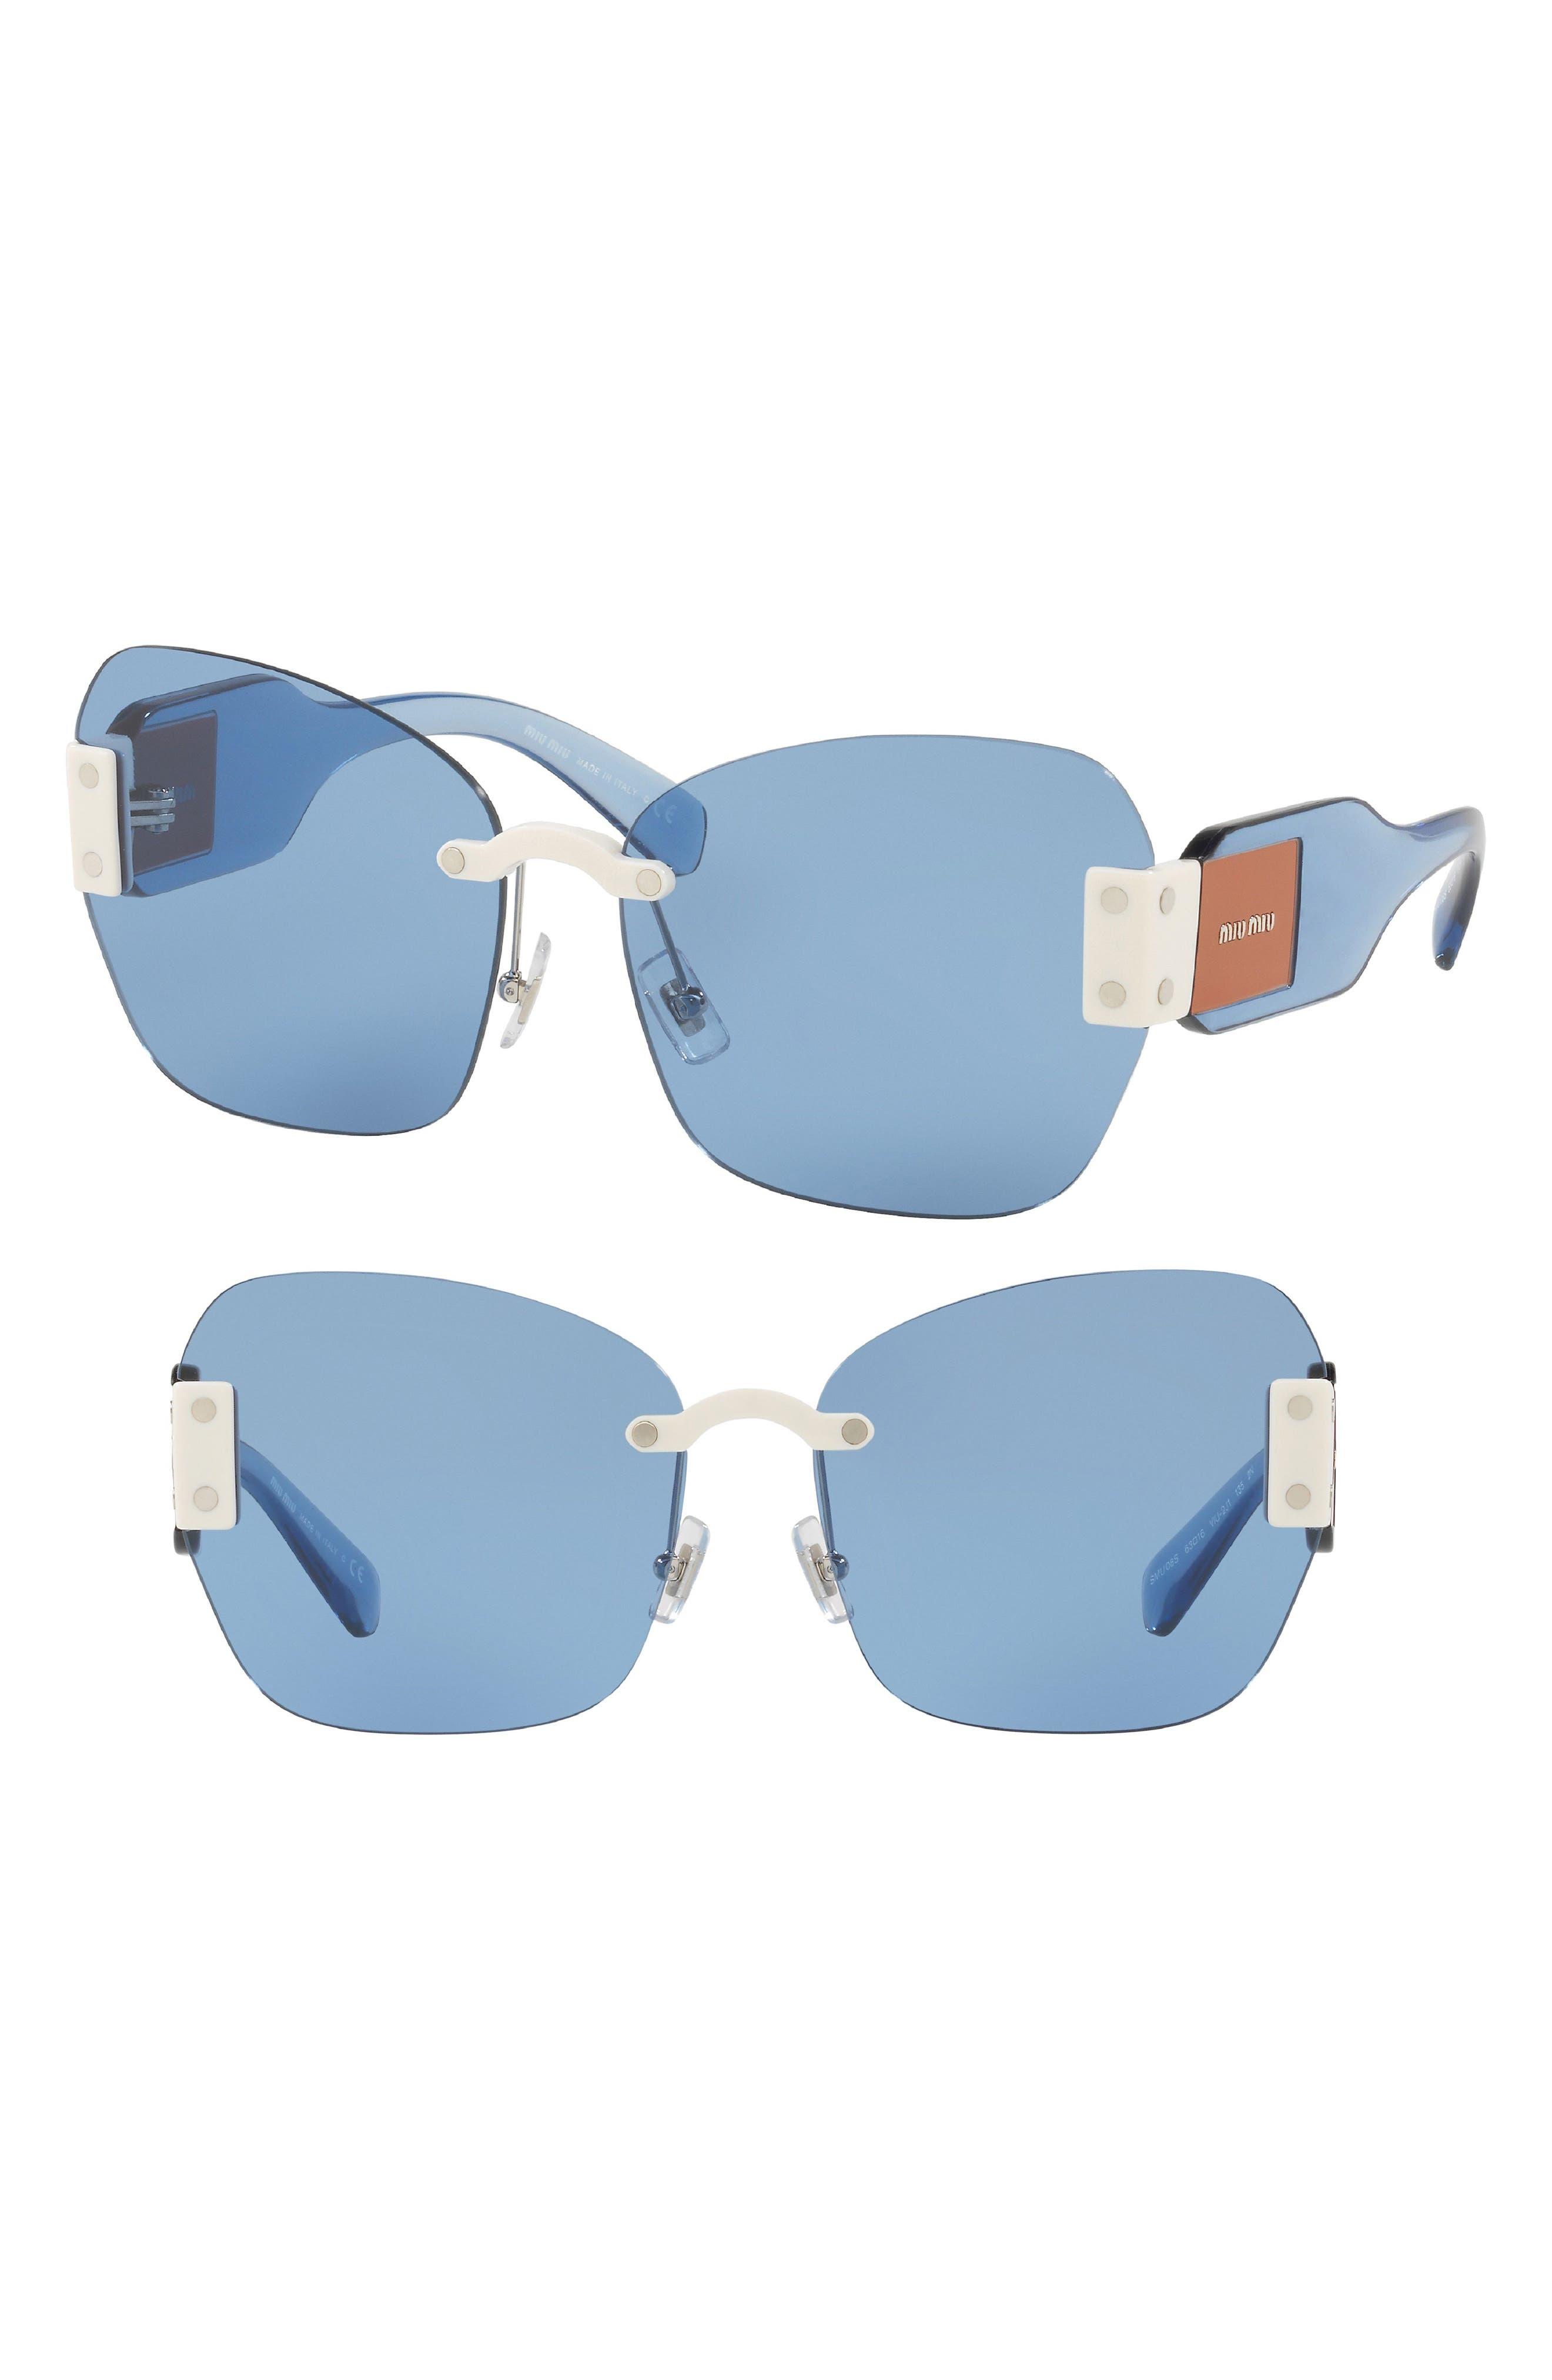 Miu Miu 63mm Rimless Sunglasses